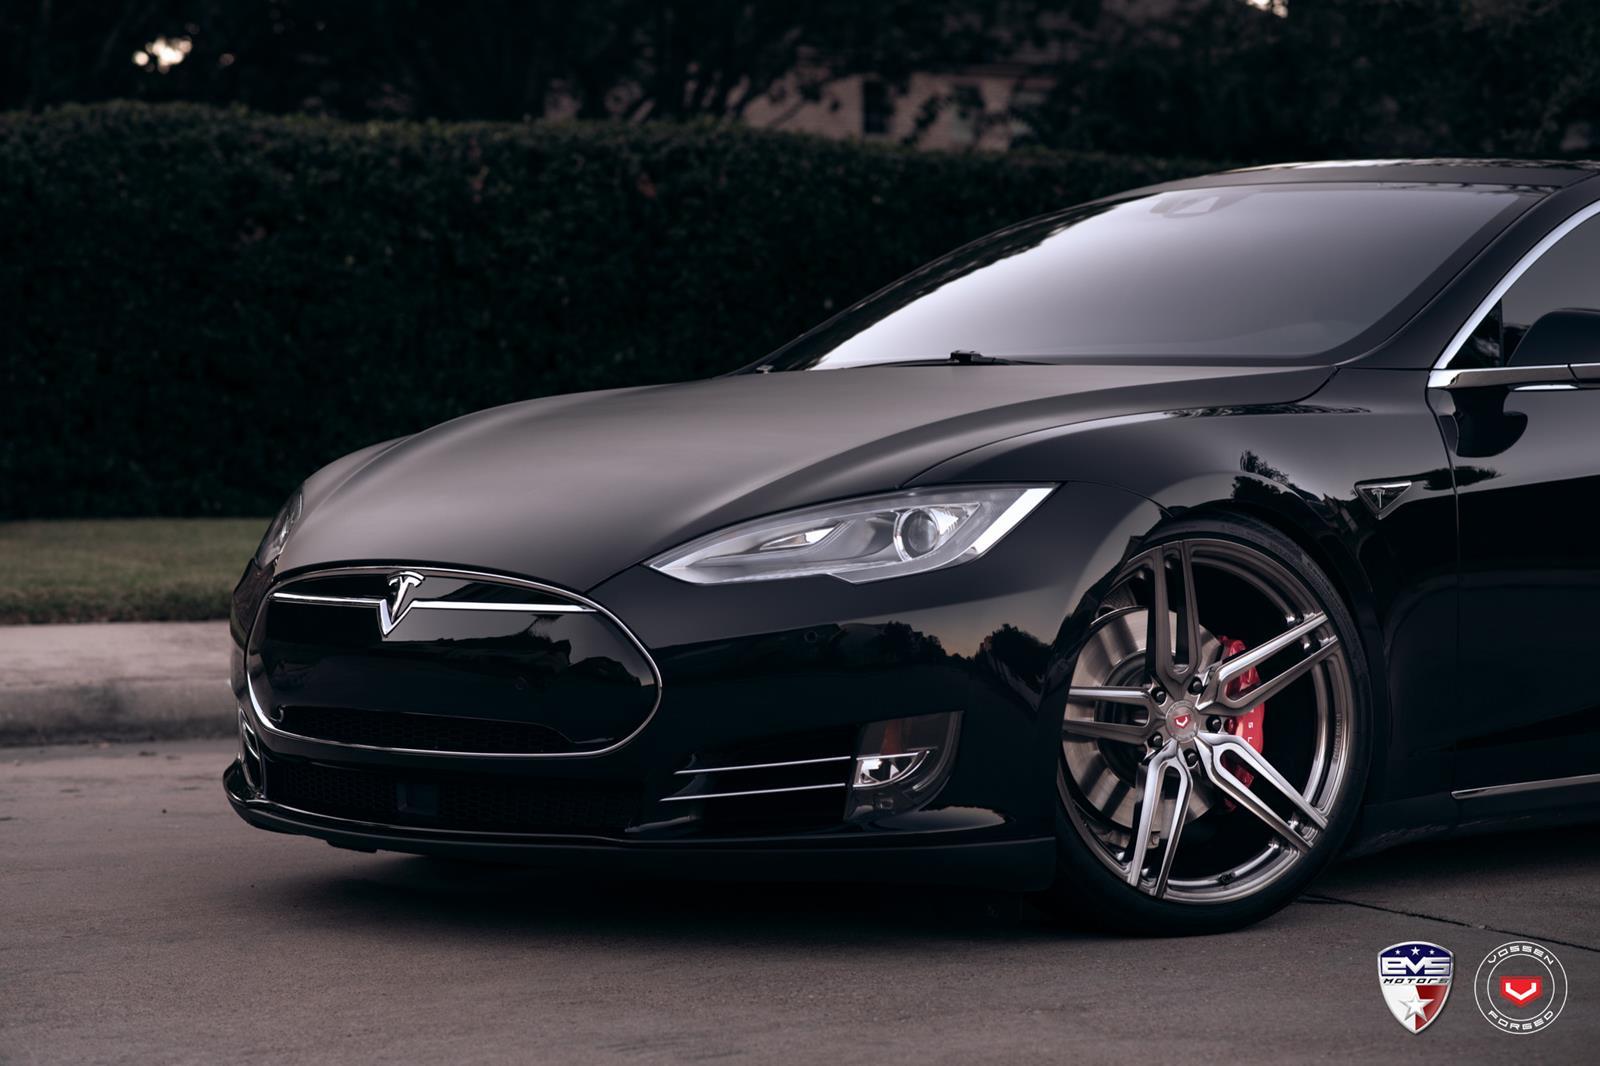 Tesla_Model S_HC-1_dd2b4cbe.jpg